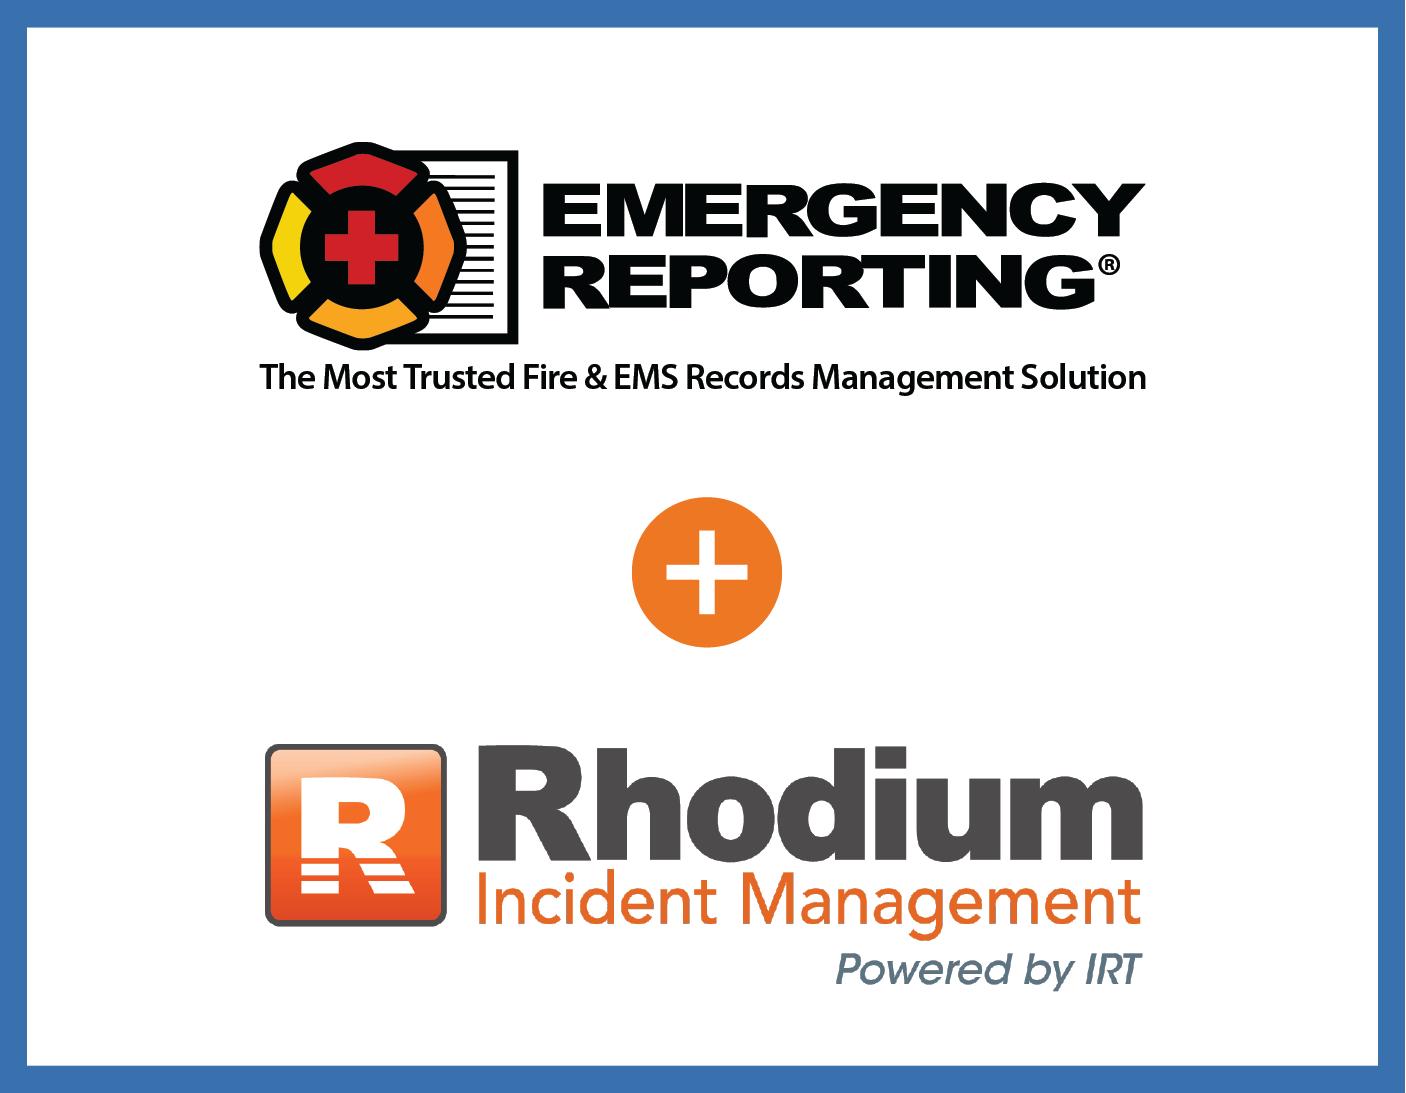 ER and Rhodium_landingpageGraphic.png